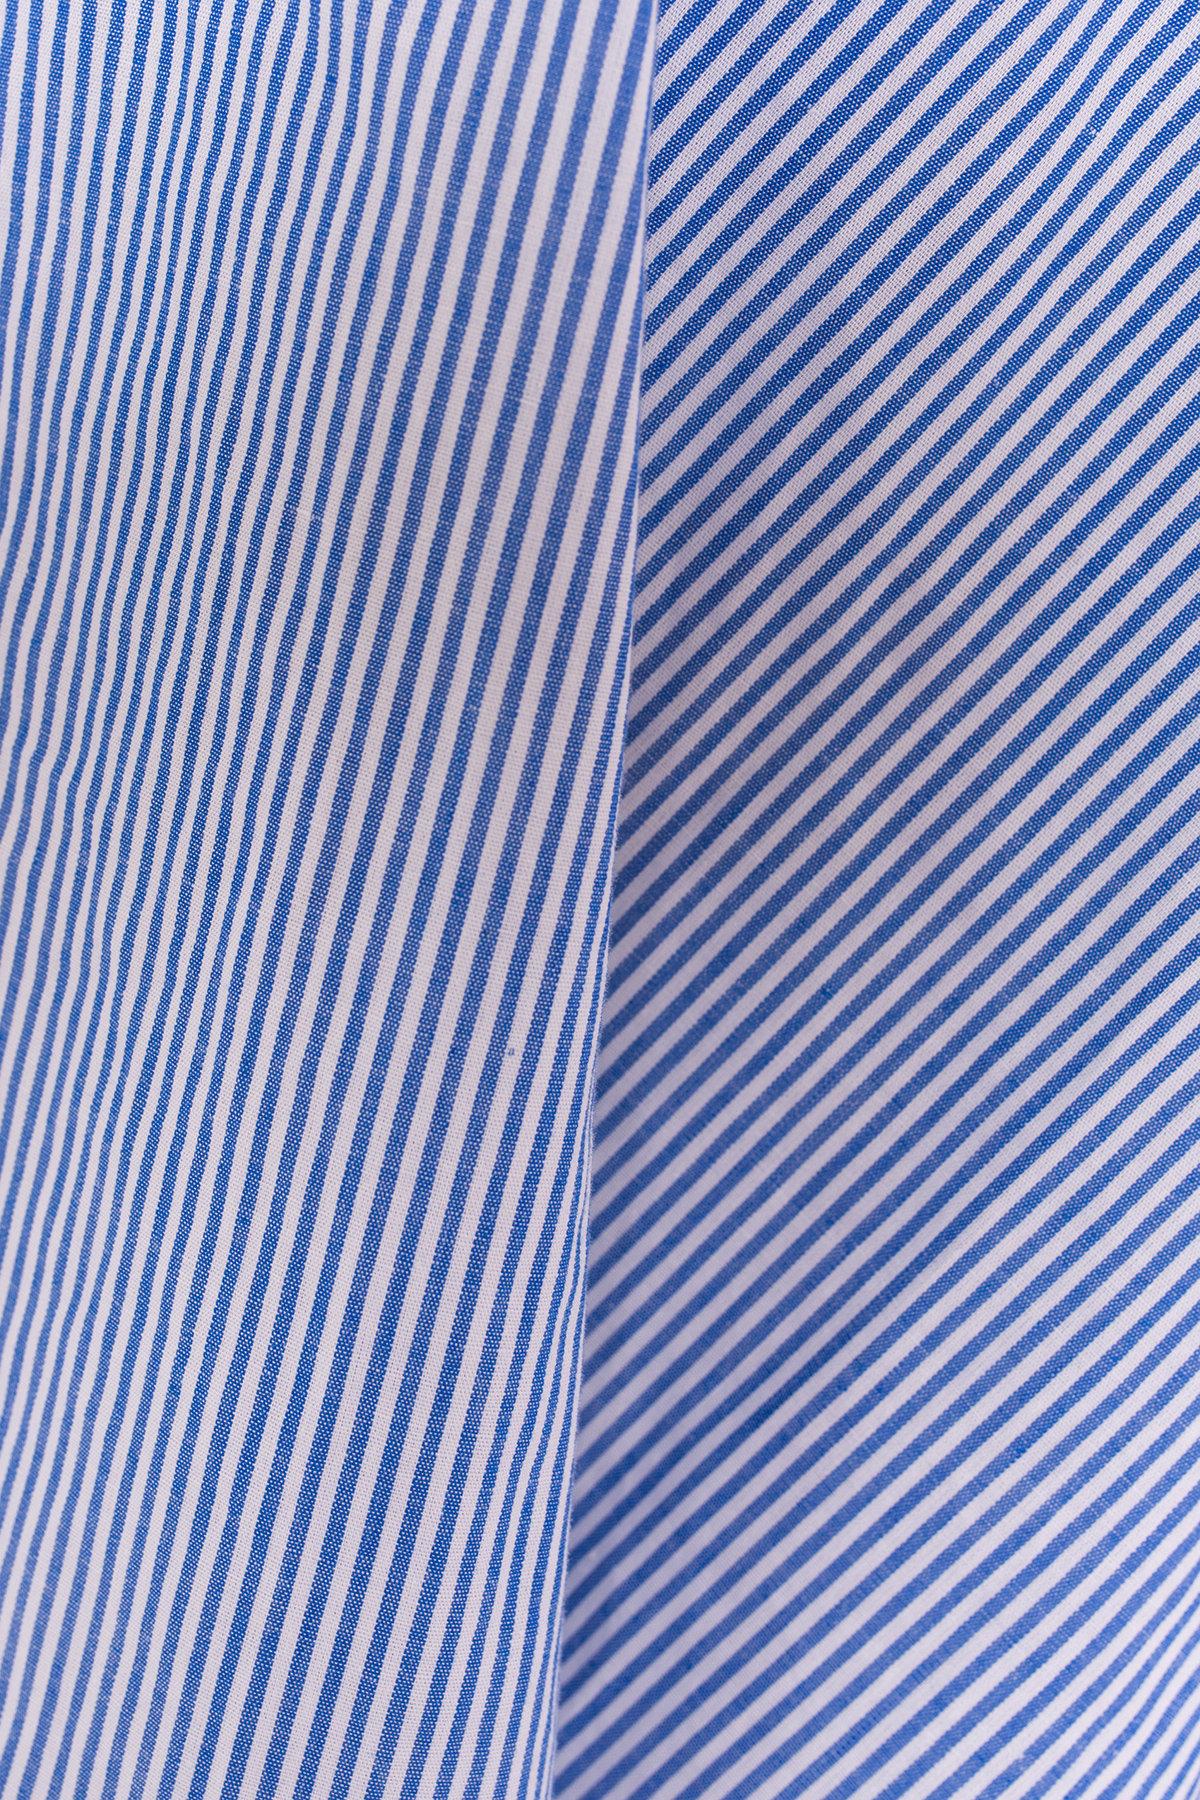 Блуза Арина 3154 Цвет: Синий/белая полоска